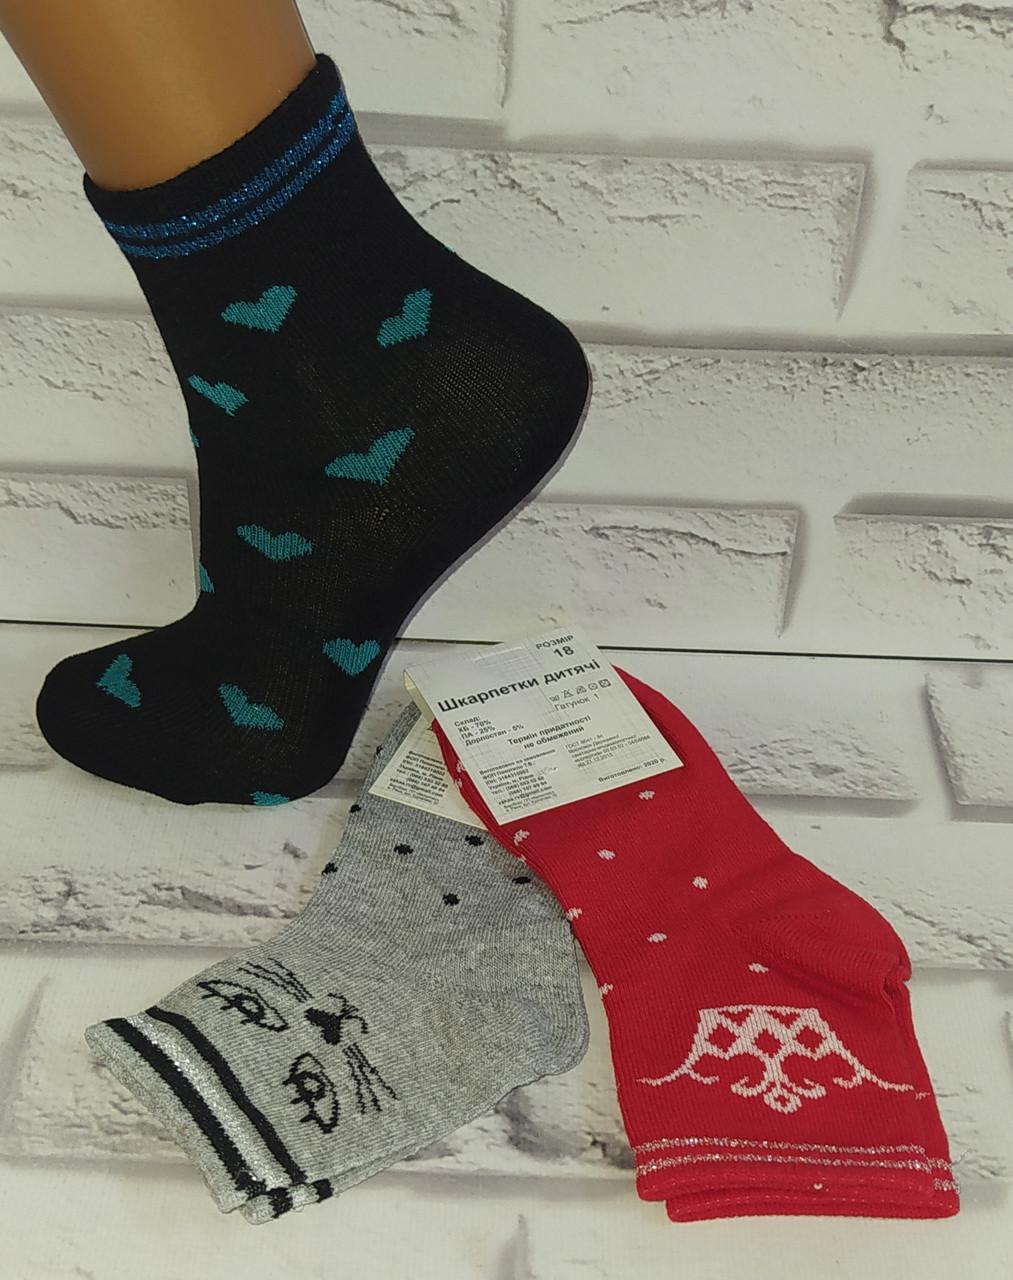 Детские носки за 1 пару 27-29 раз. Добра пара